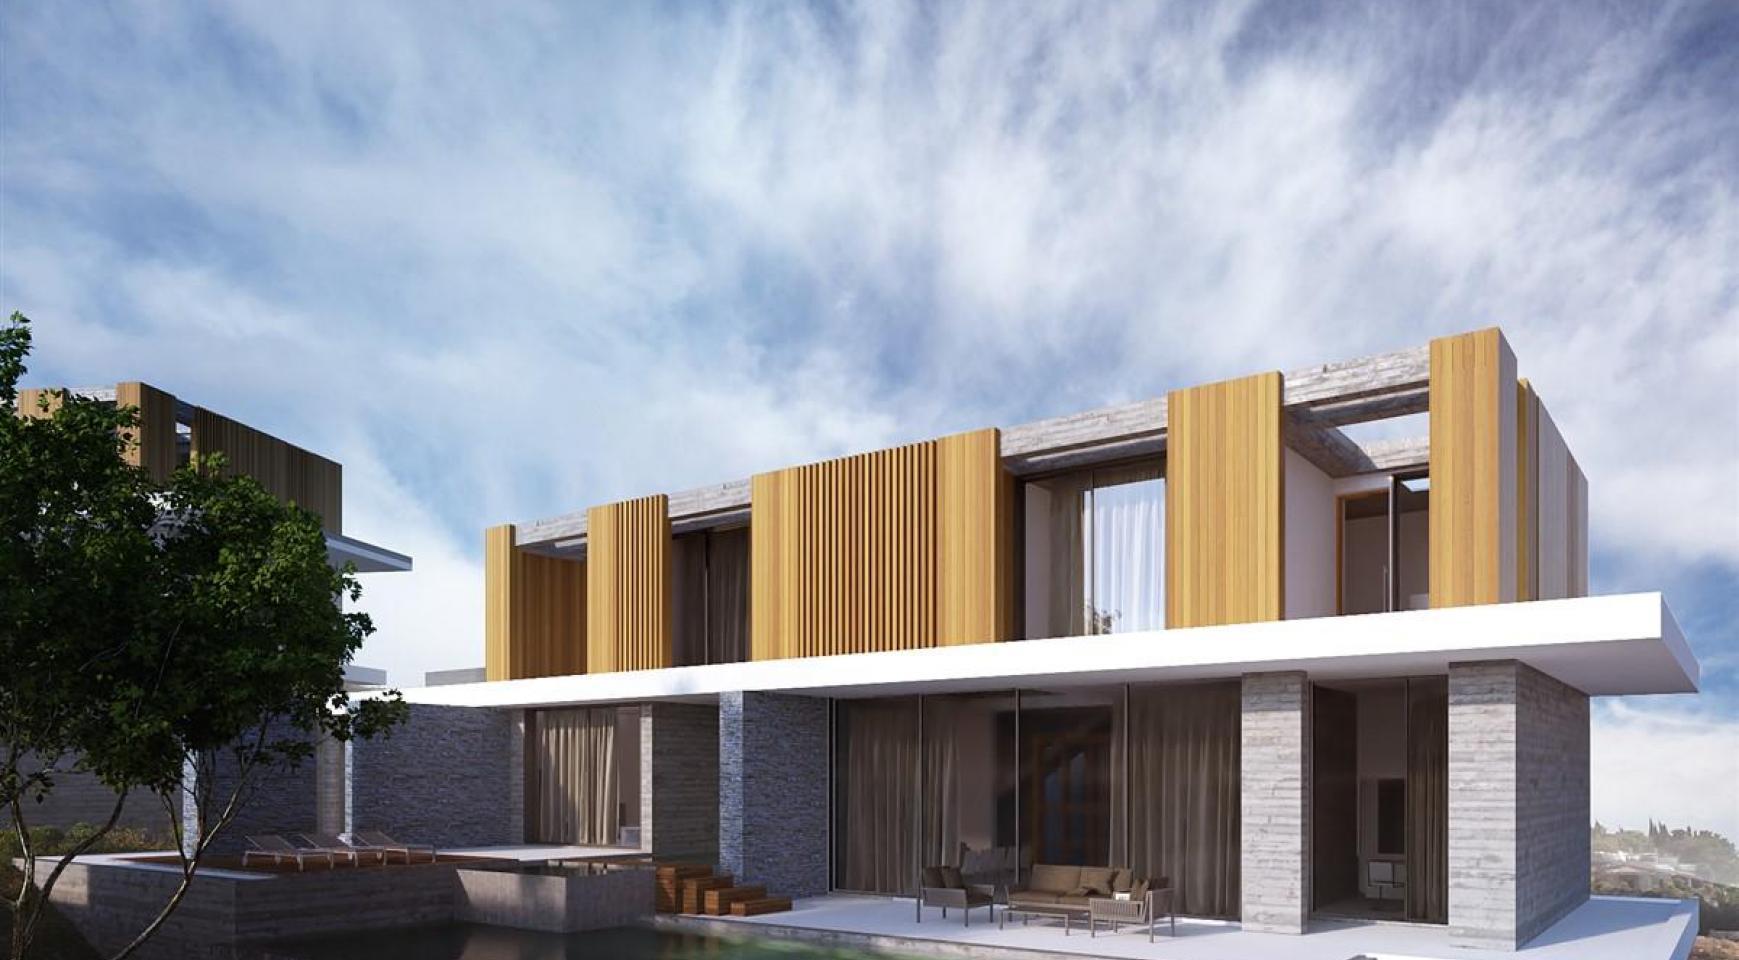 Exclusive 3 Bedroom Villa with Stunning Views in Germasogeia - 4